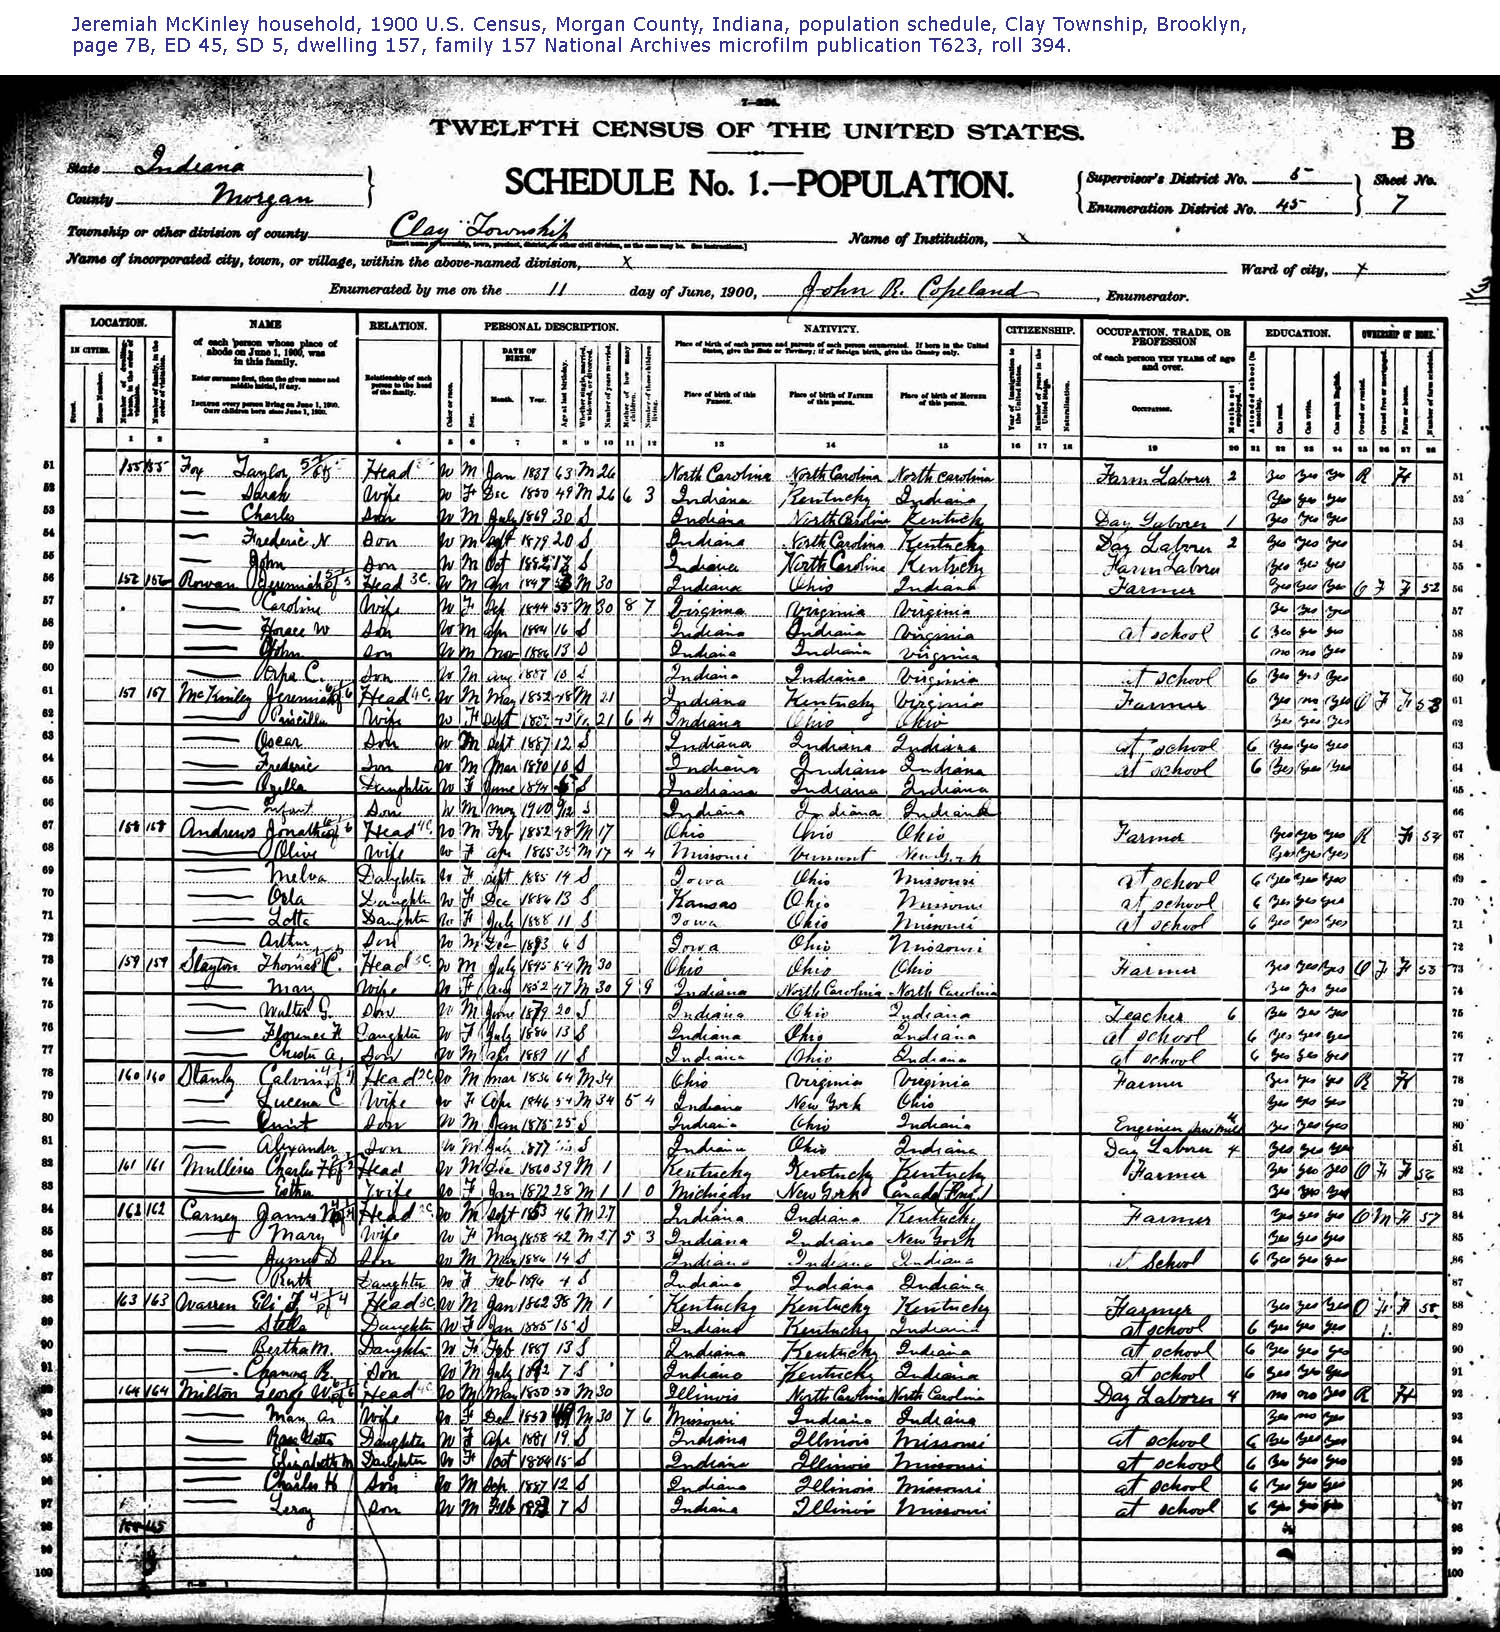 Morgan county indiana marriage license